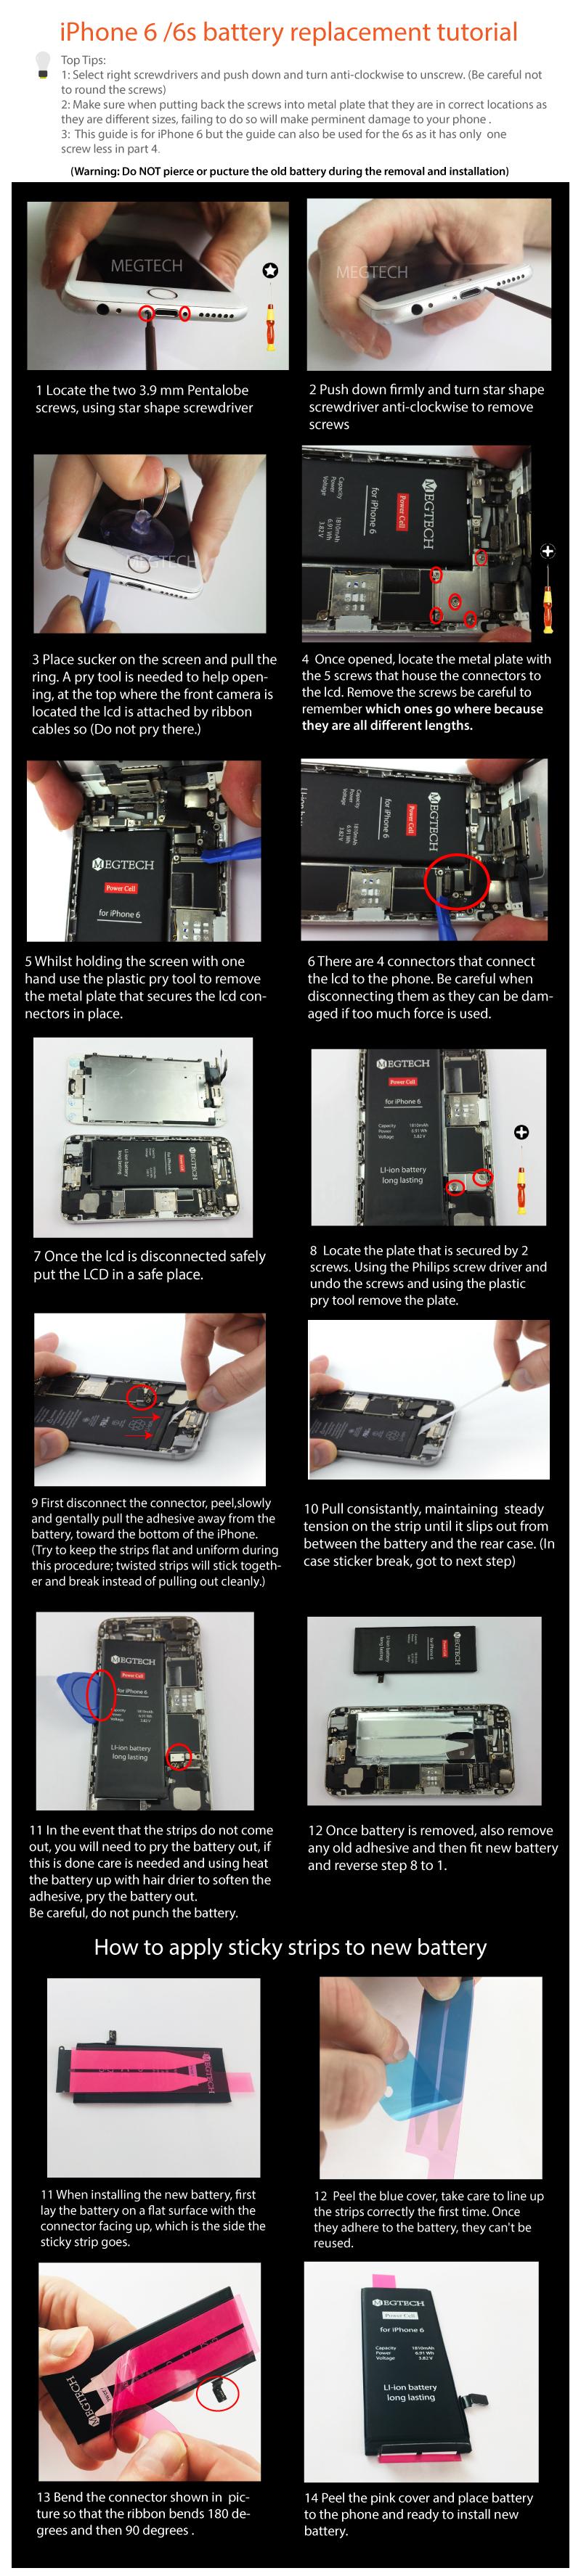 iphone 6 battery tutorial